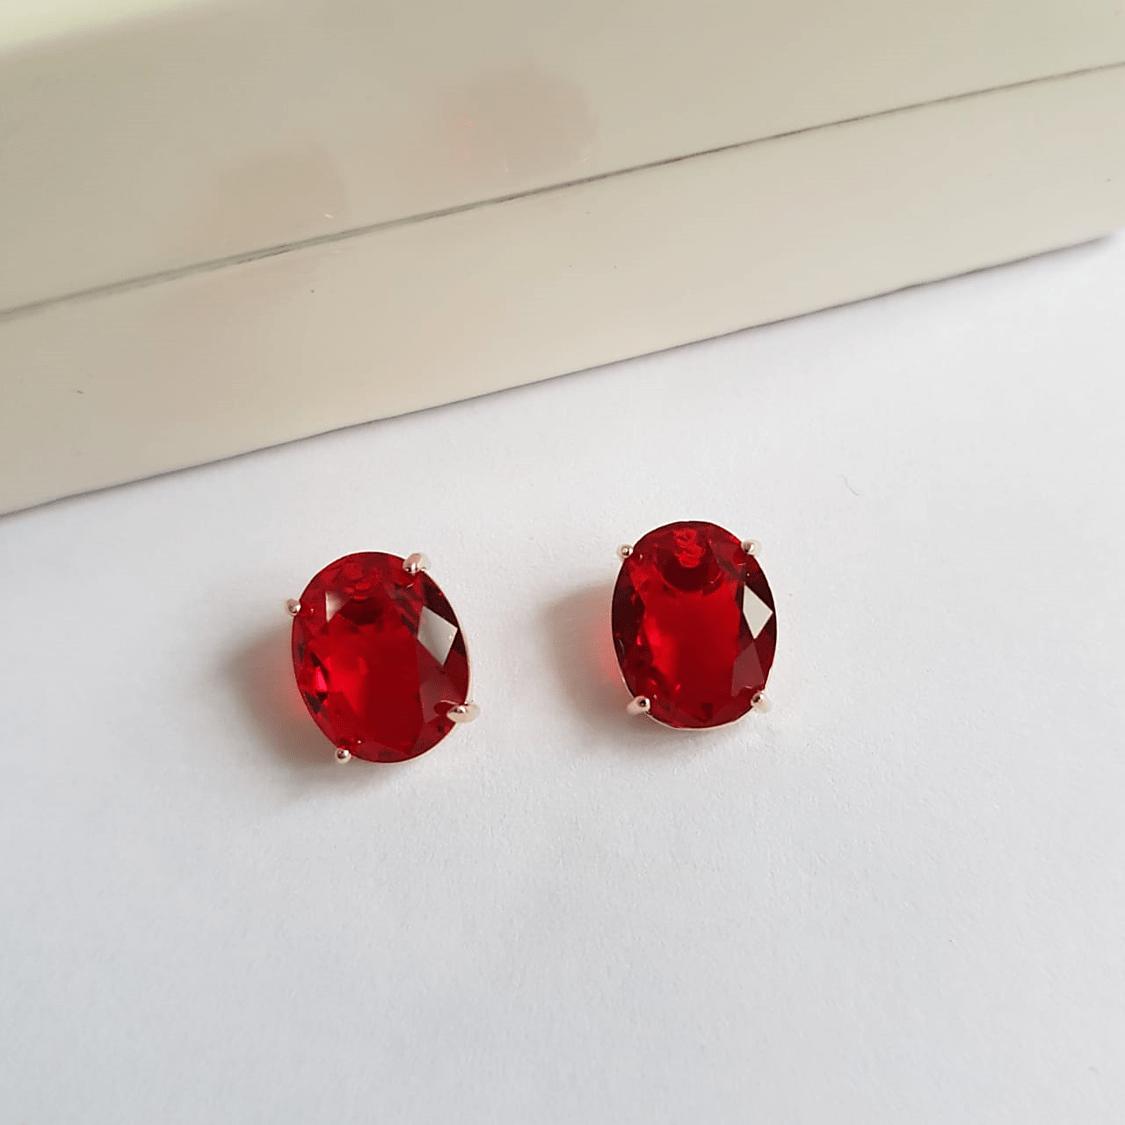 Brinco botão cristal vermelho rubi-oval 8 x10mm